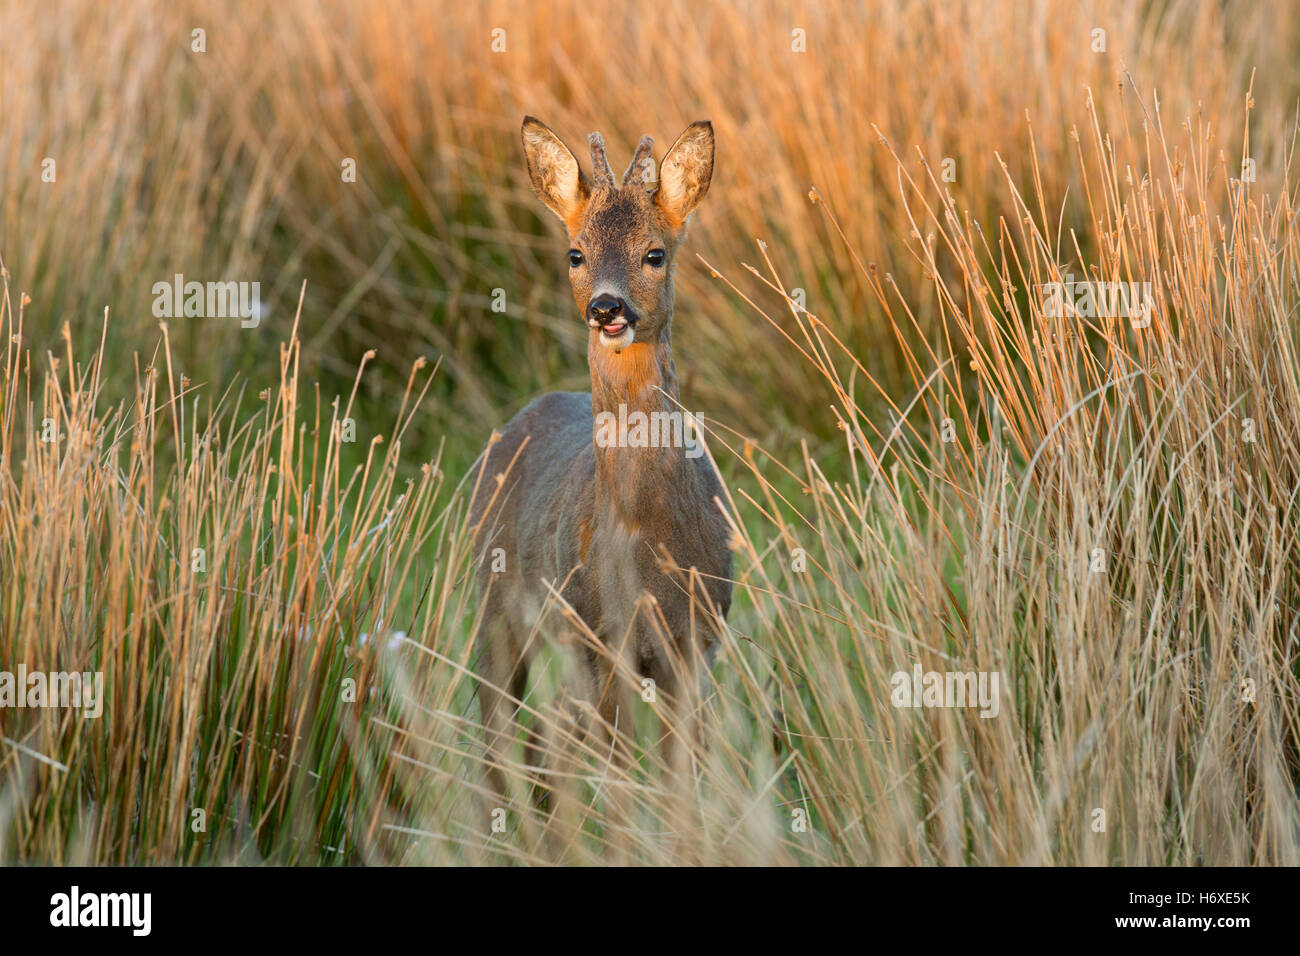 Roe Deer; Capreolus capreolus Single Buck in Meadow Scotland; UK - Stock Image